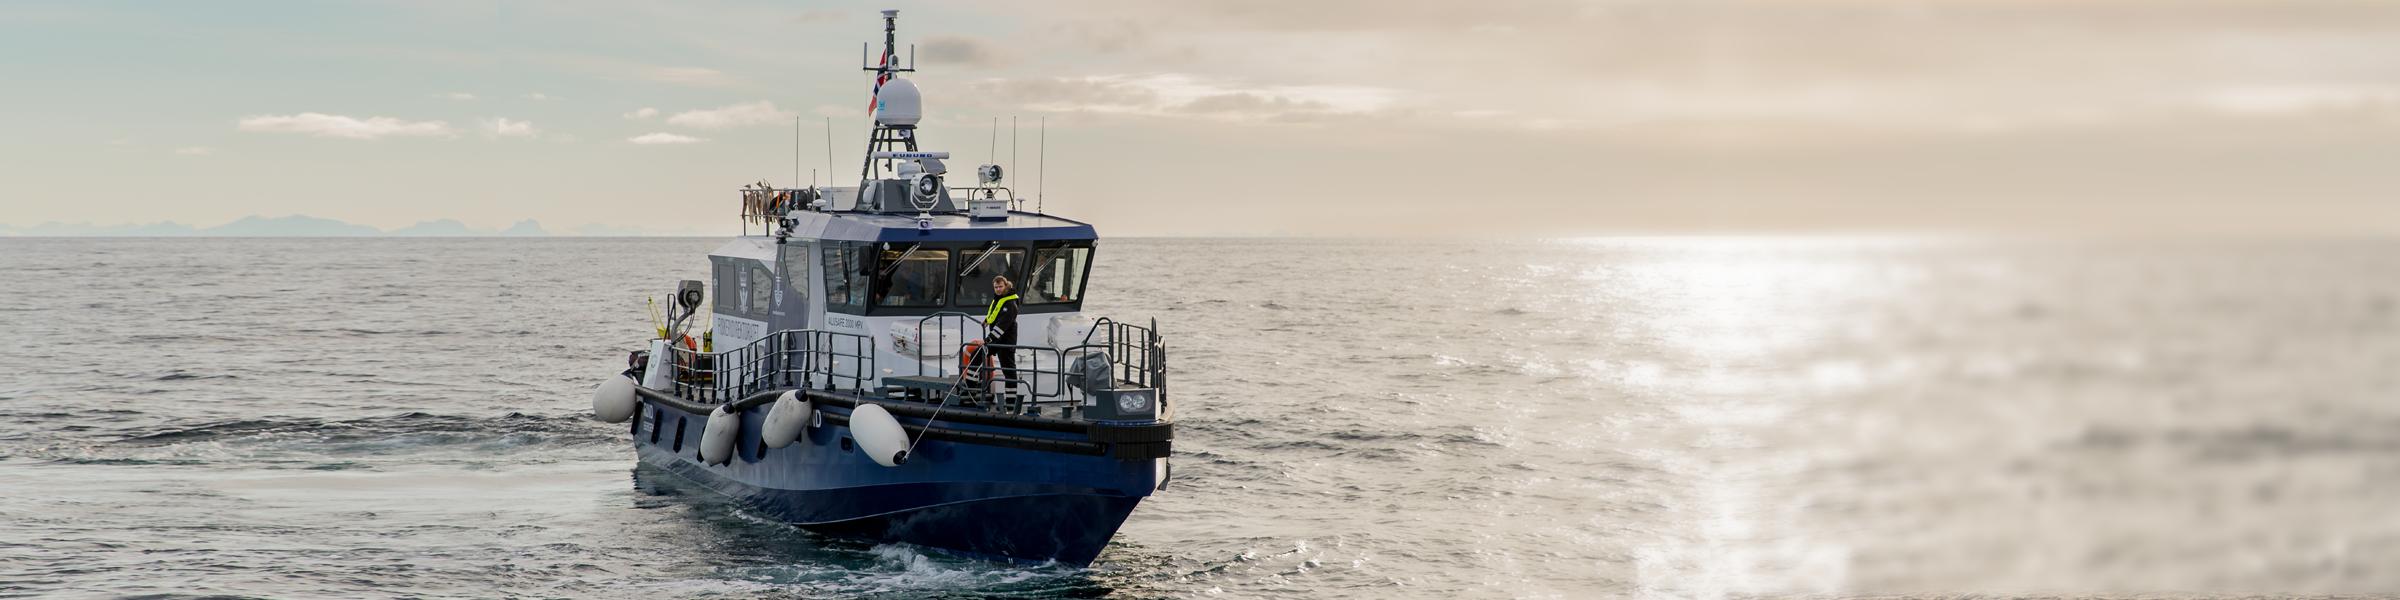 bilde-fiskeridirektoratet-ba°t